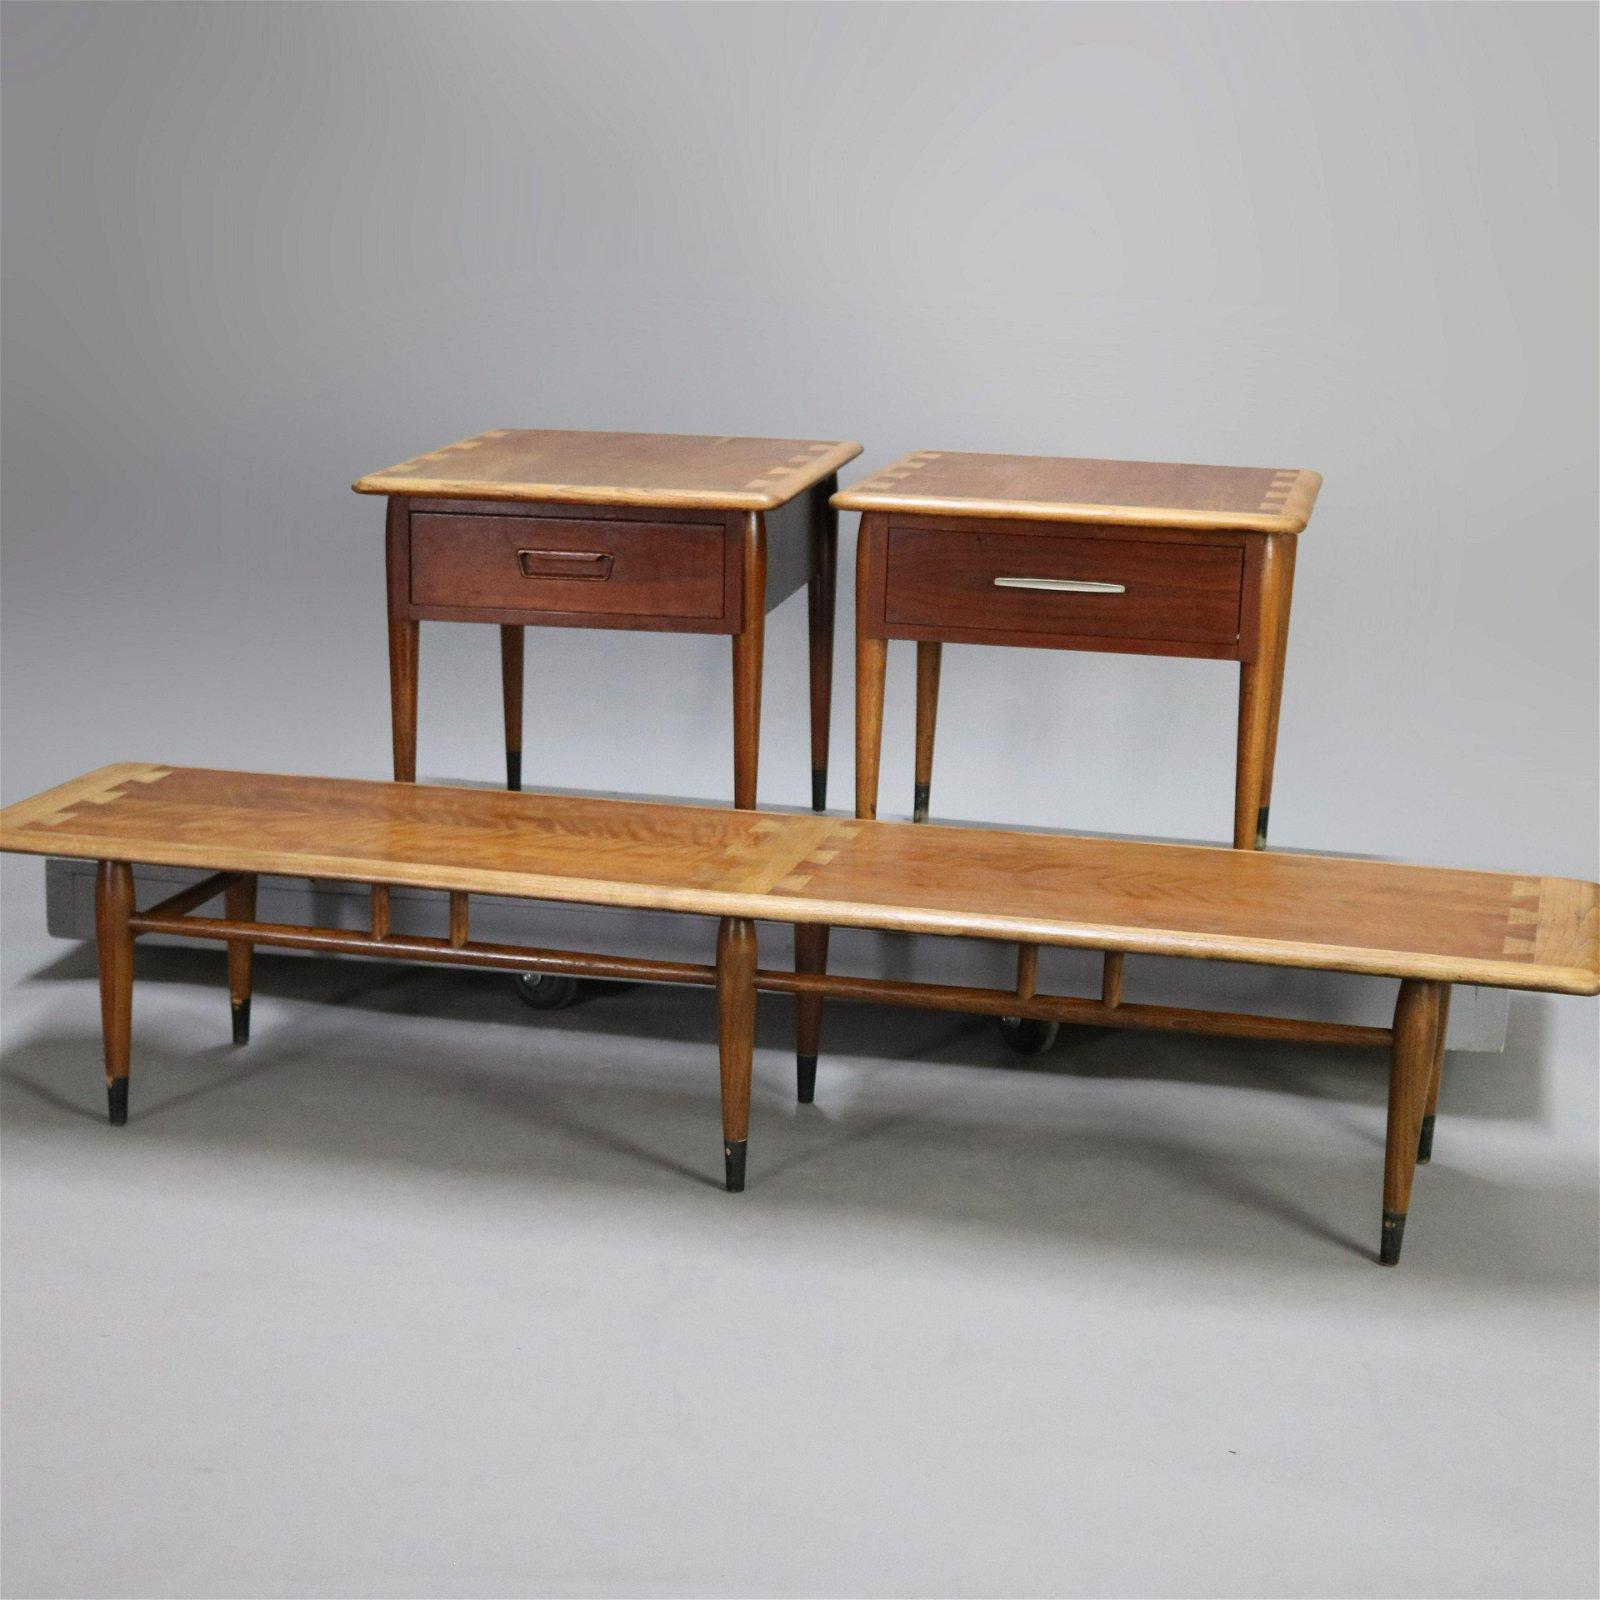 Midcentury Danish Modern Ash & Walnut Coffee End Tables